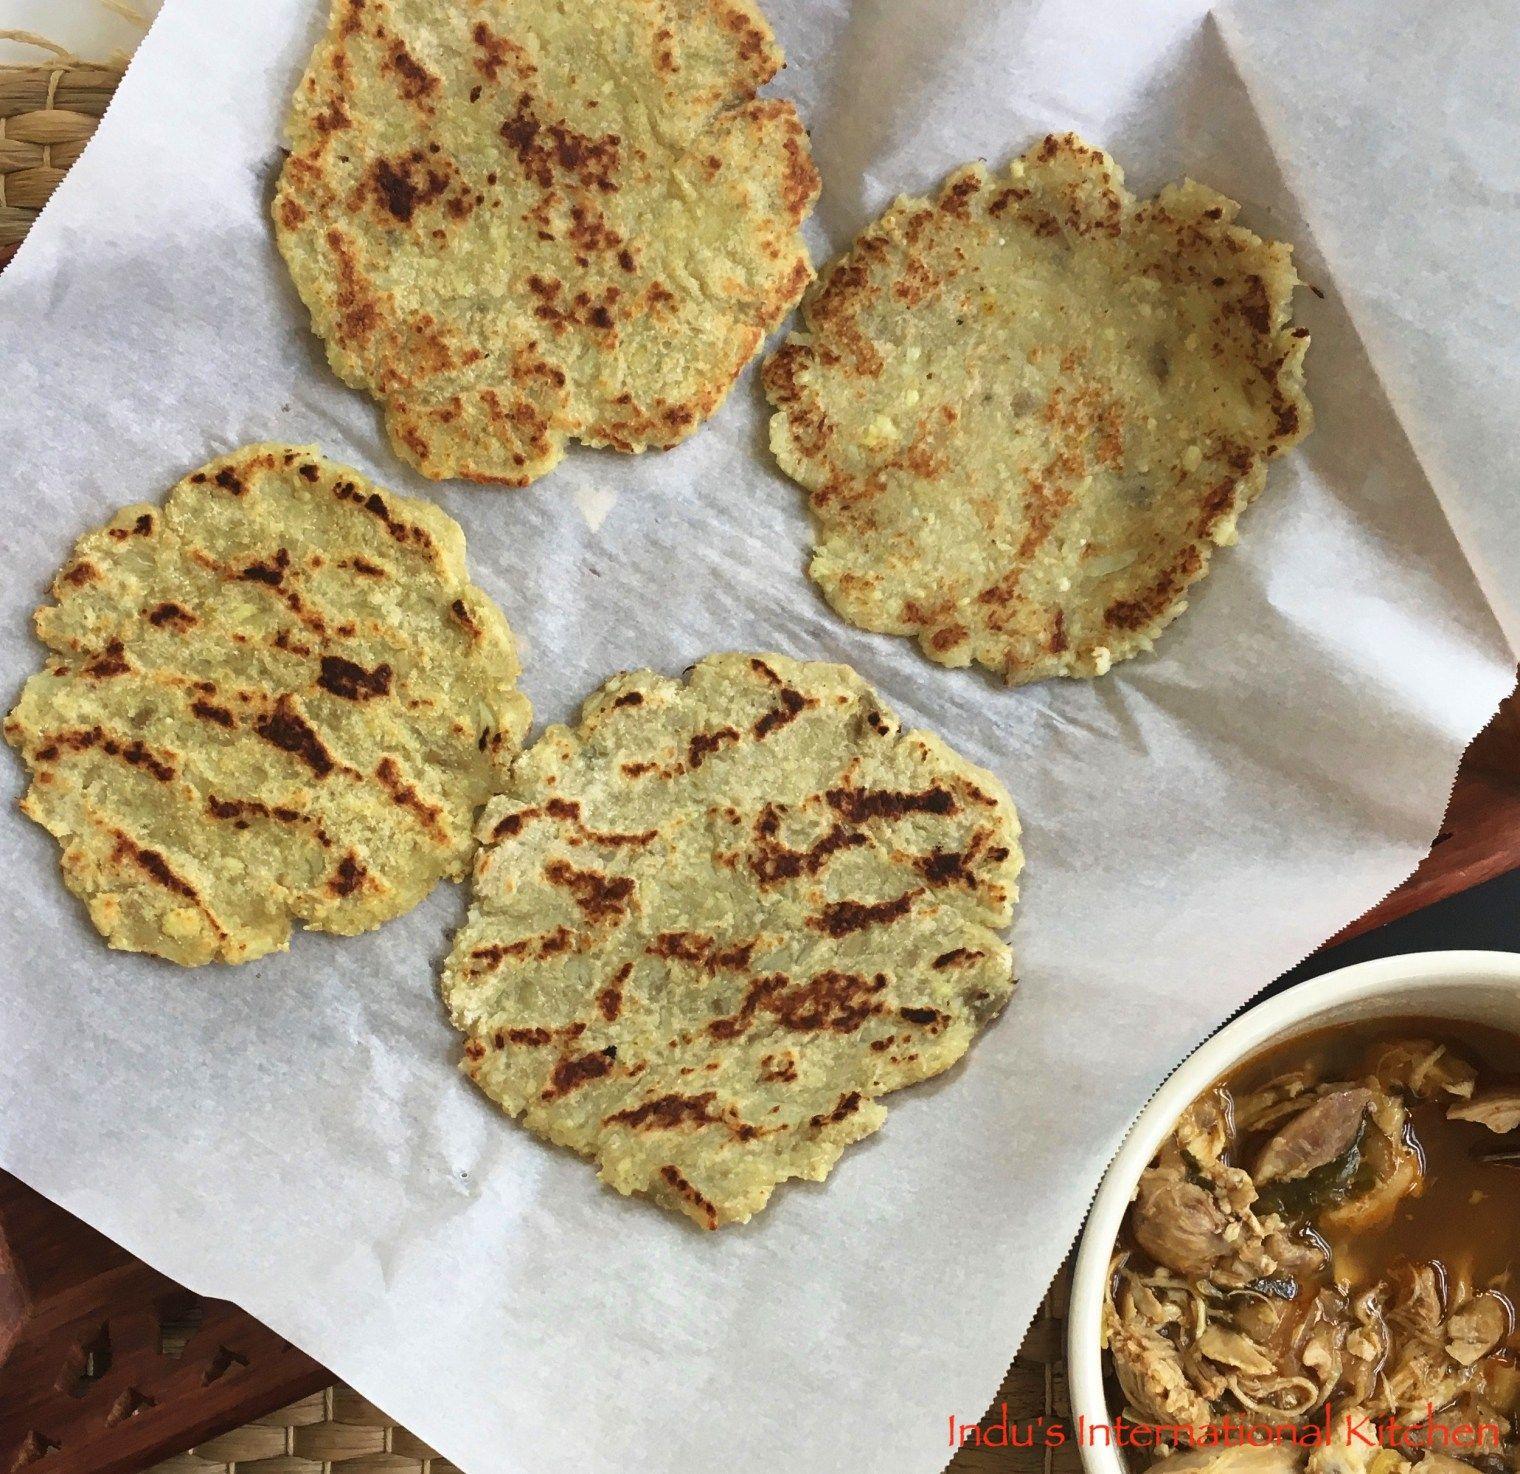 Cauliflower Naan Recipes With Naan Bread Anti Inflammatory